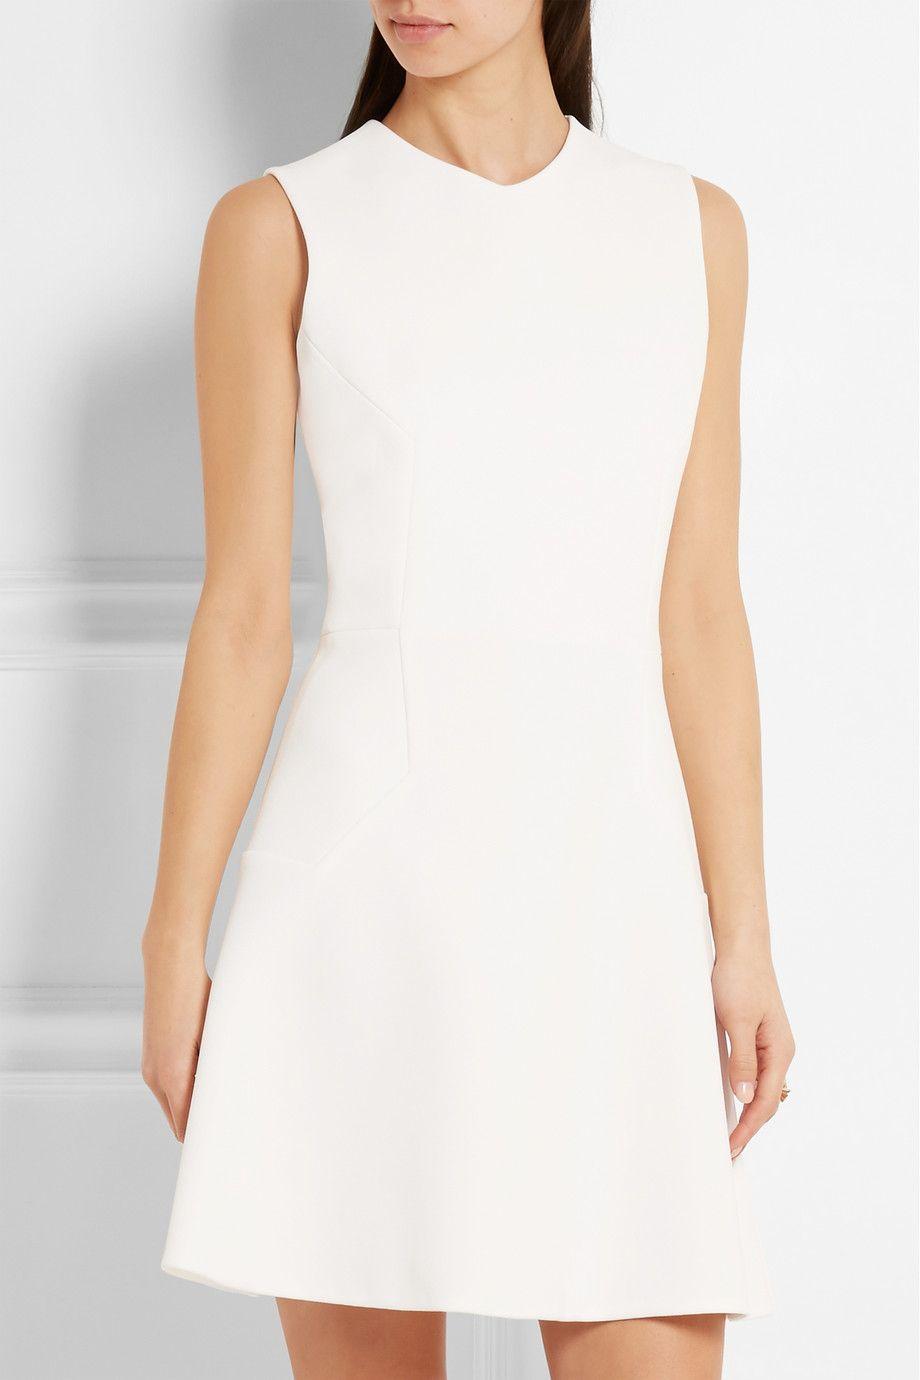 White Crepe Mini Dress Victoria Beckham Fit Flare Dress Womens Dresses Dresses [ 1380 x 920 Pixel ]